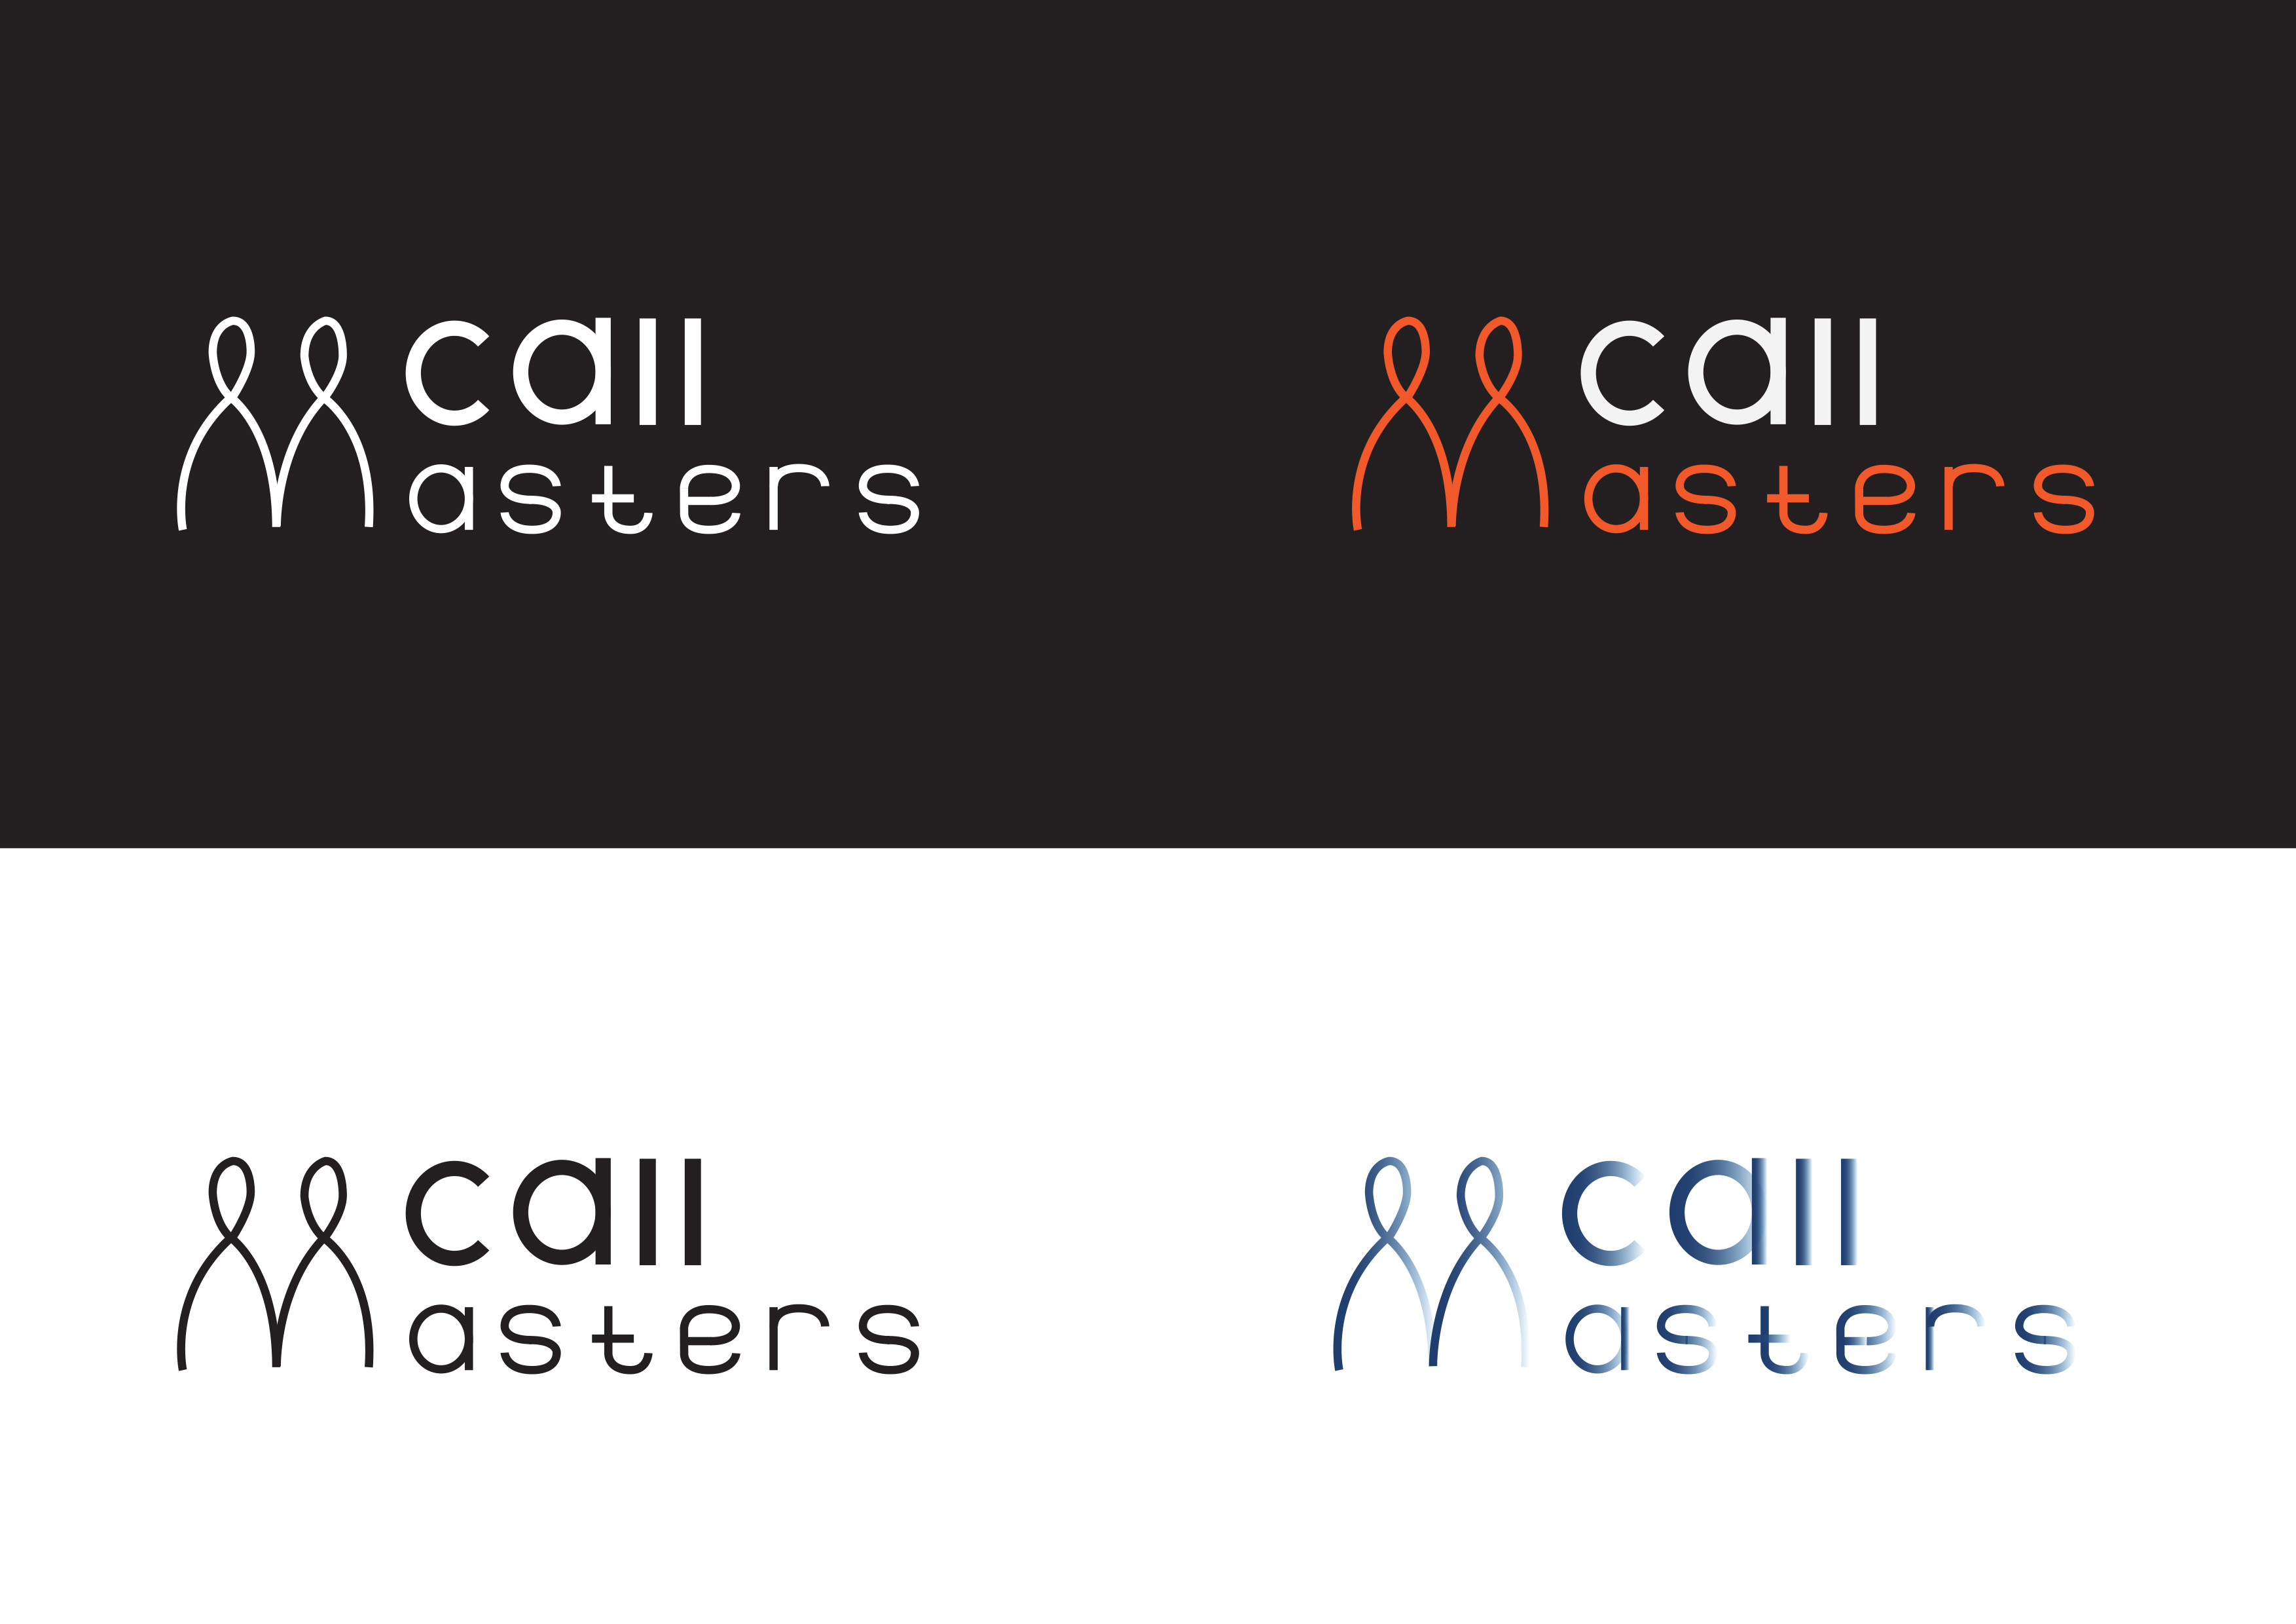 Логотип call-центра Callmasters  фото f_8085b6a10a94940d.jpg